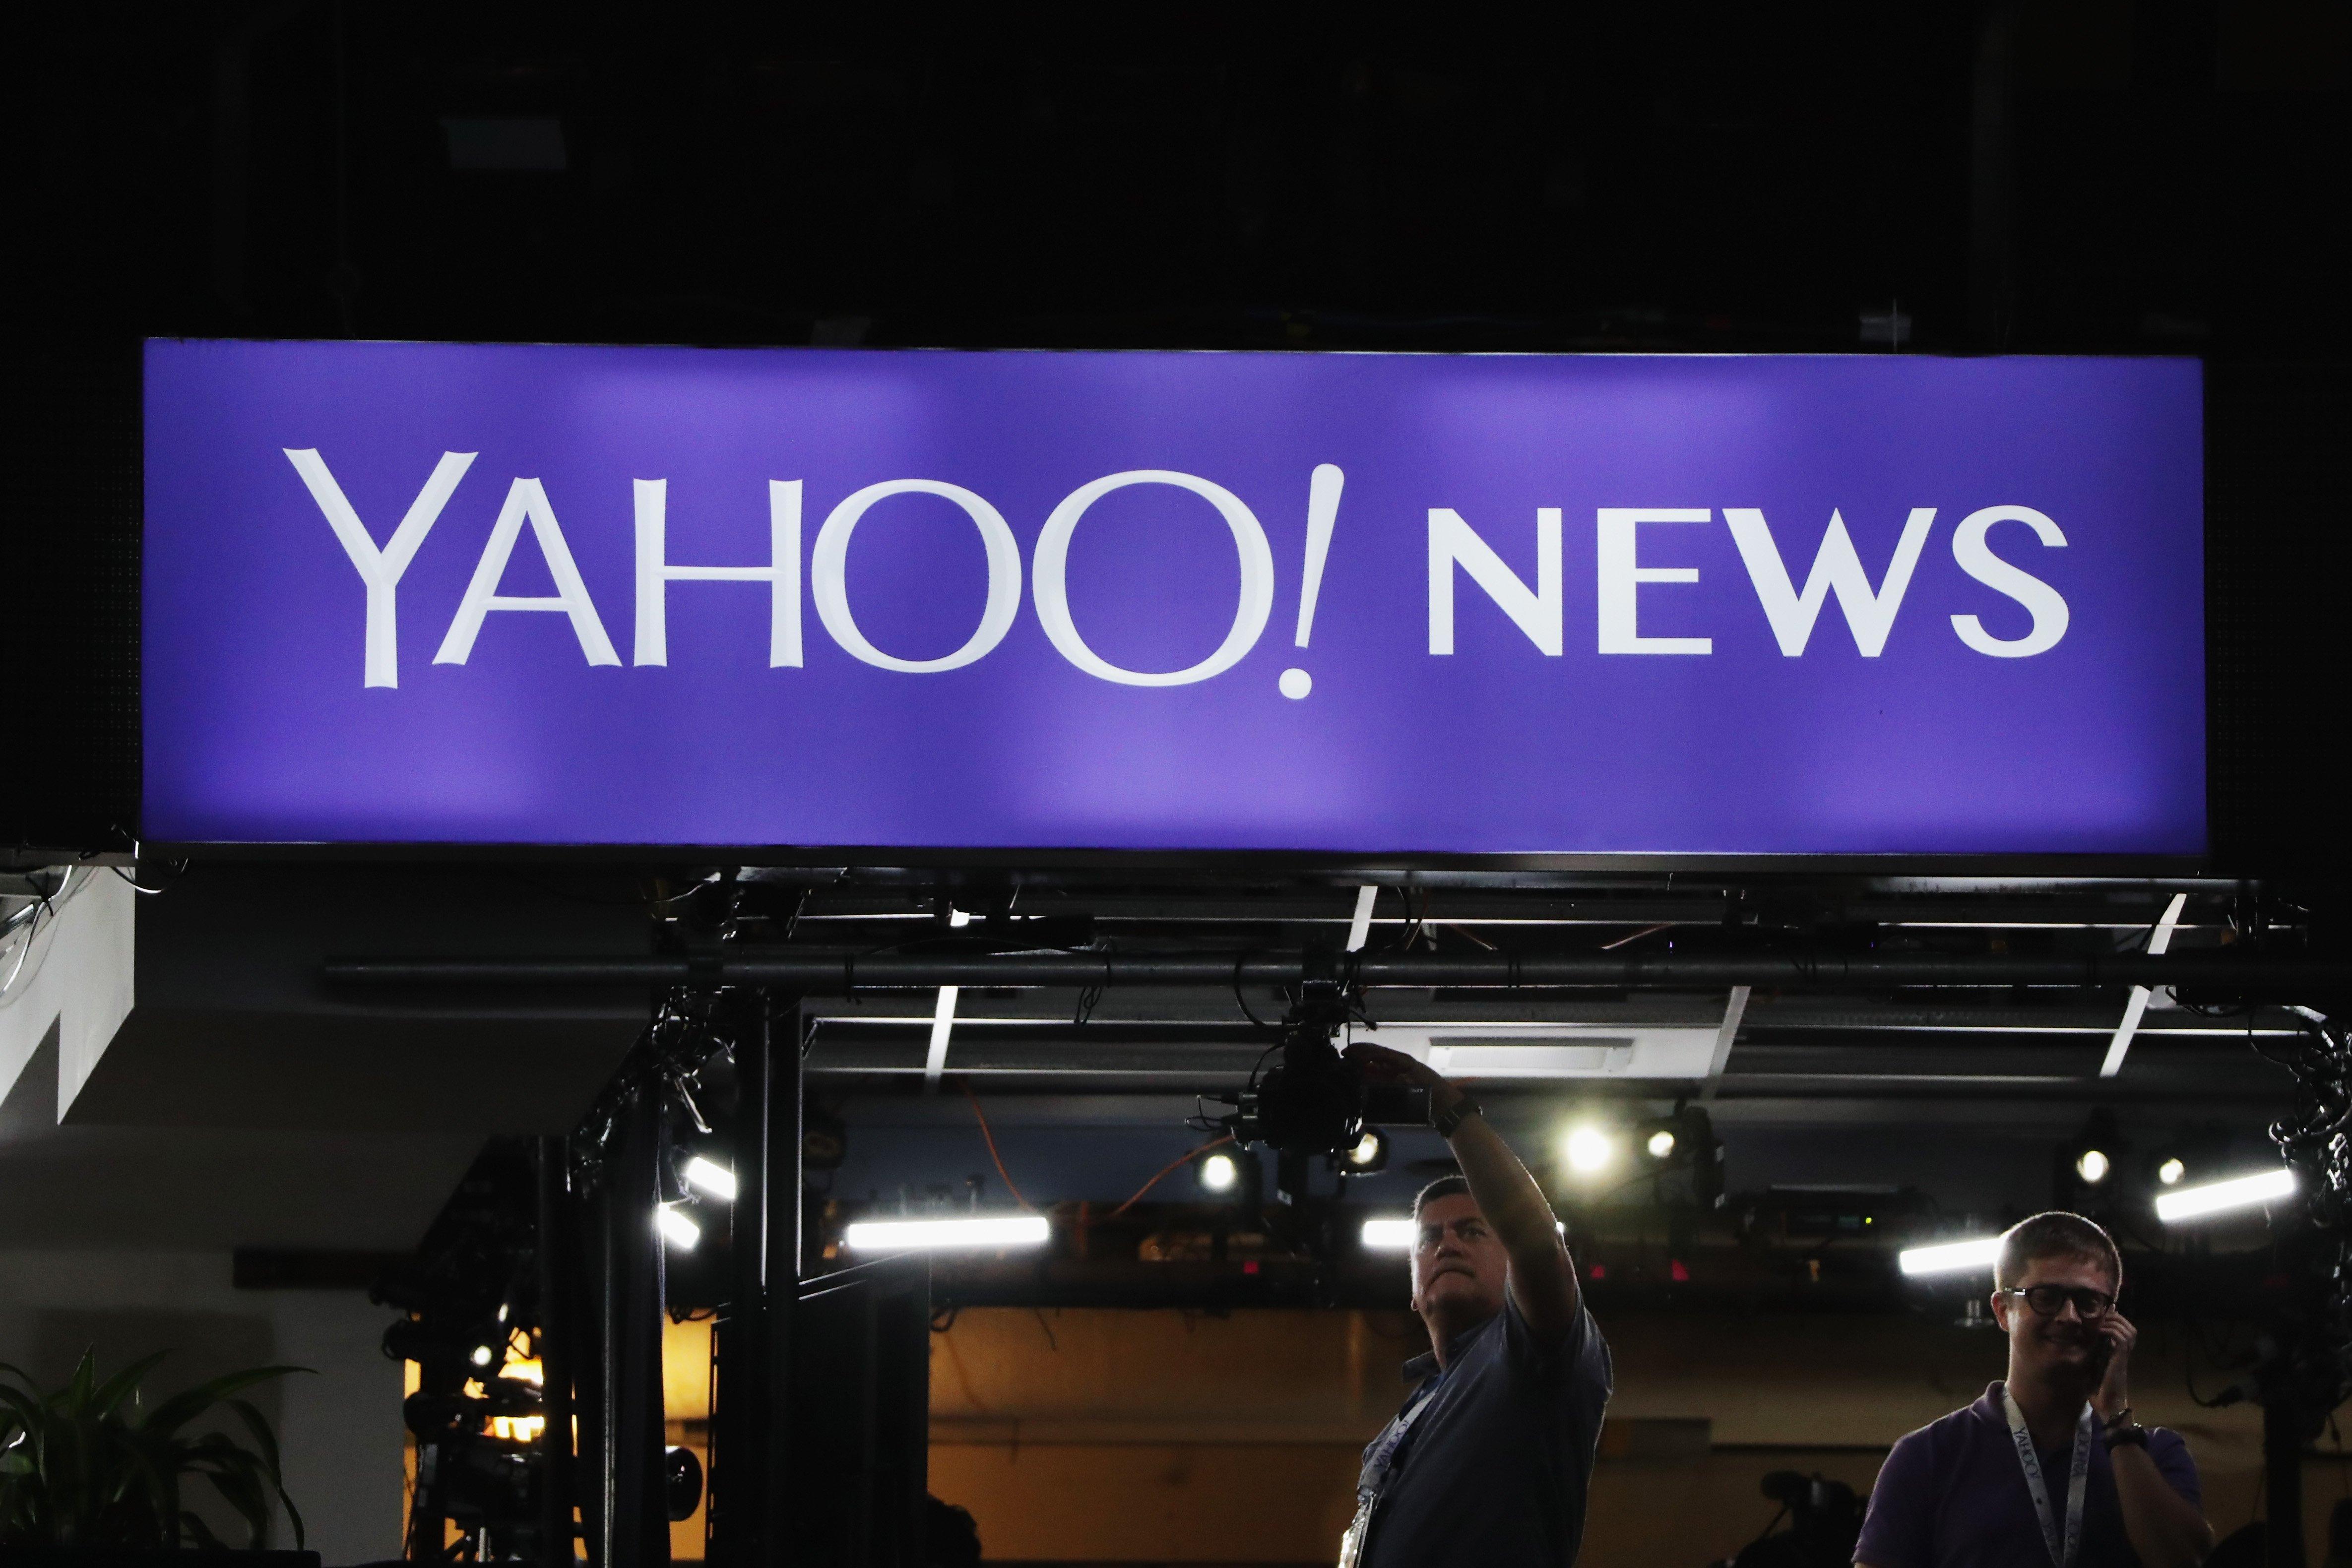 Акционеры Yahoo одобрили реализацию компании сотовому оператору Verizon